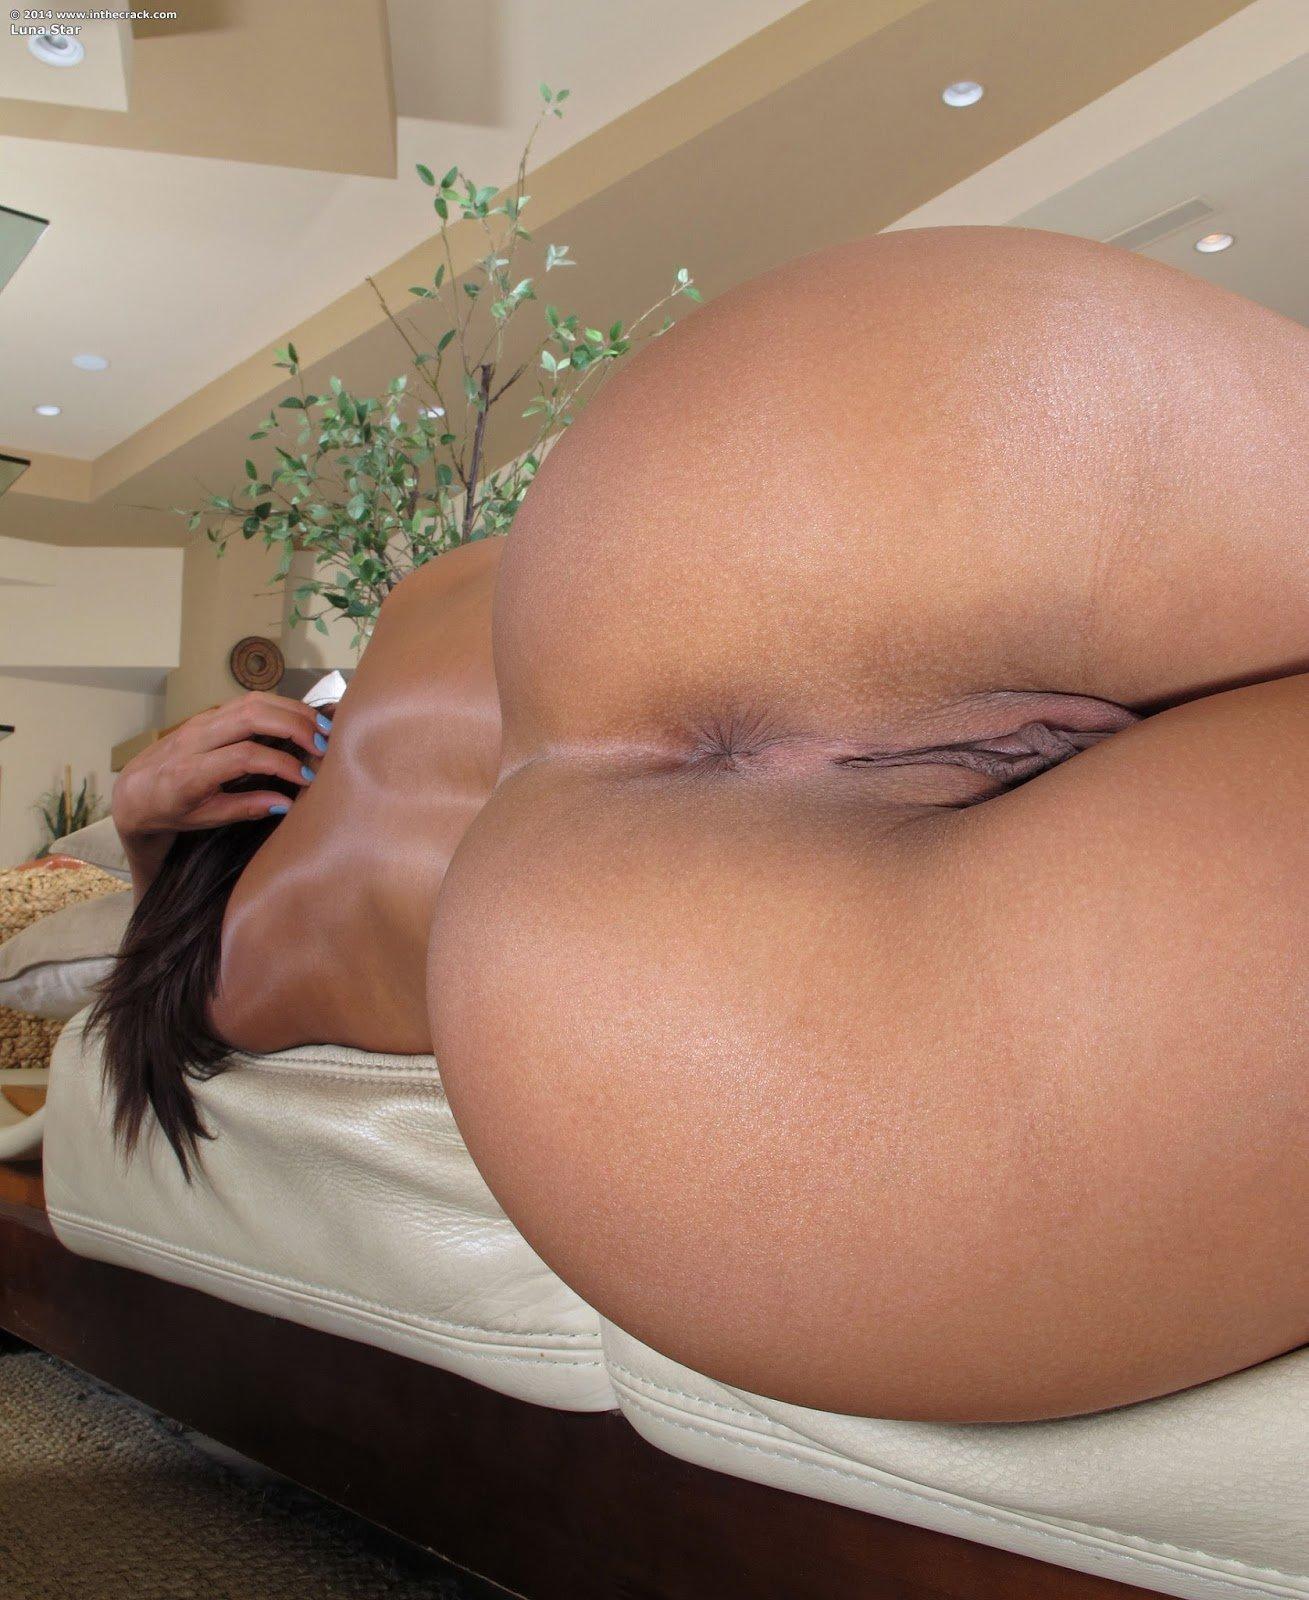 Big Round Ass Free